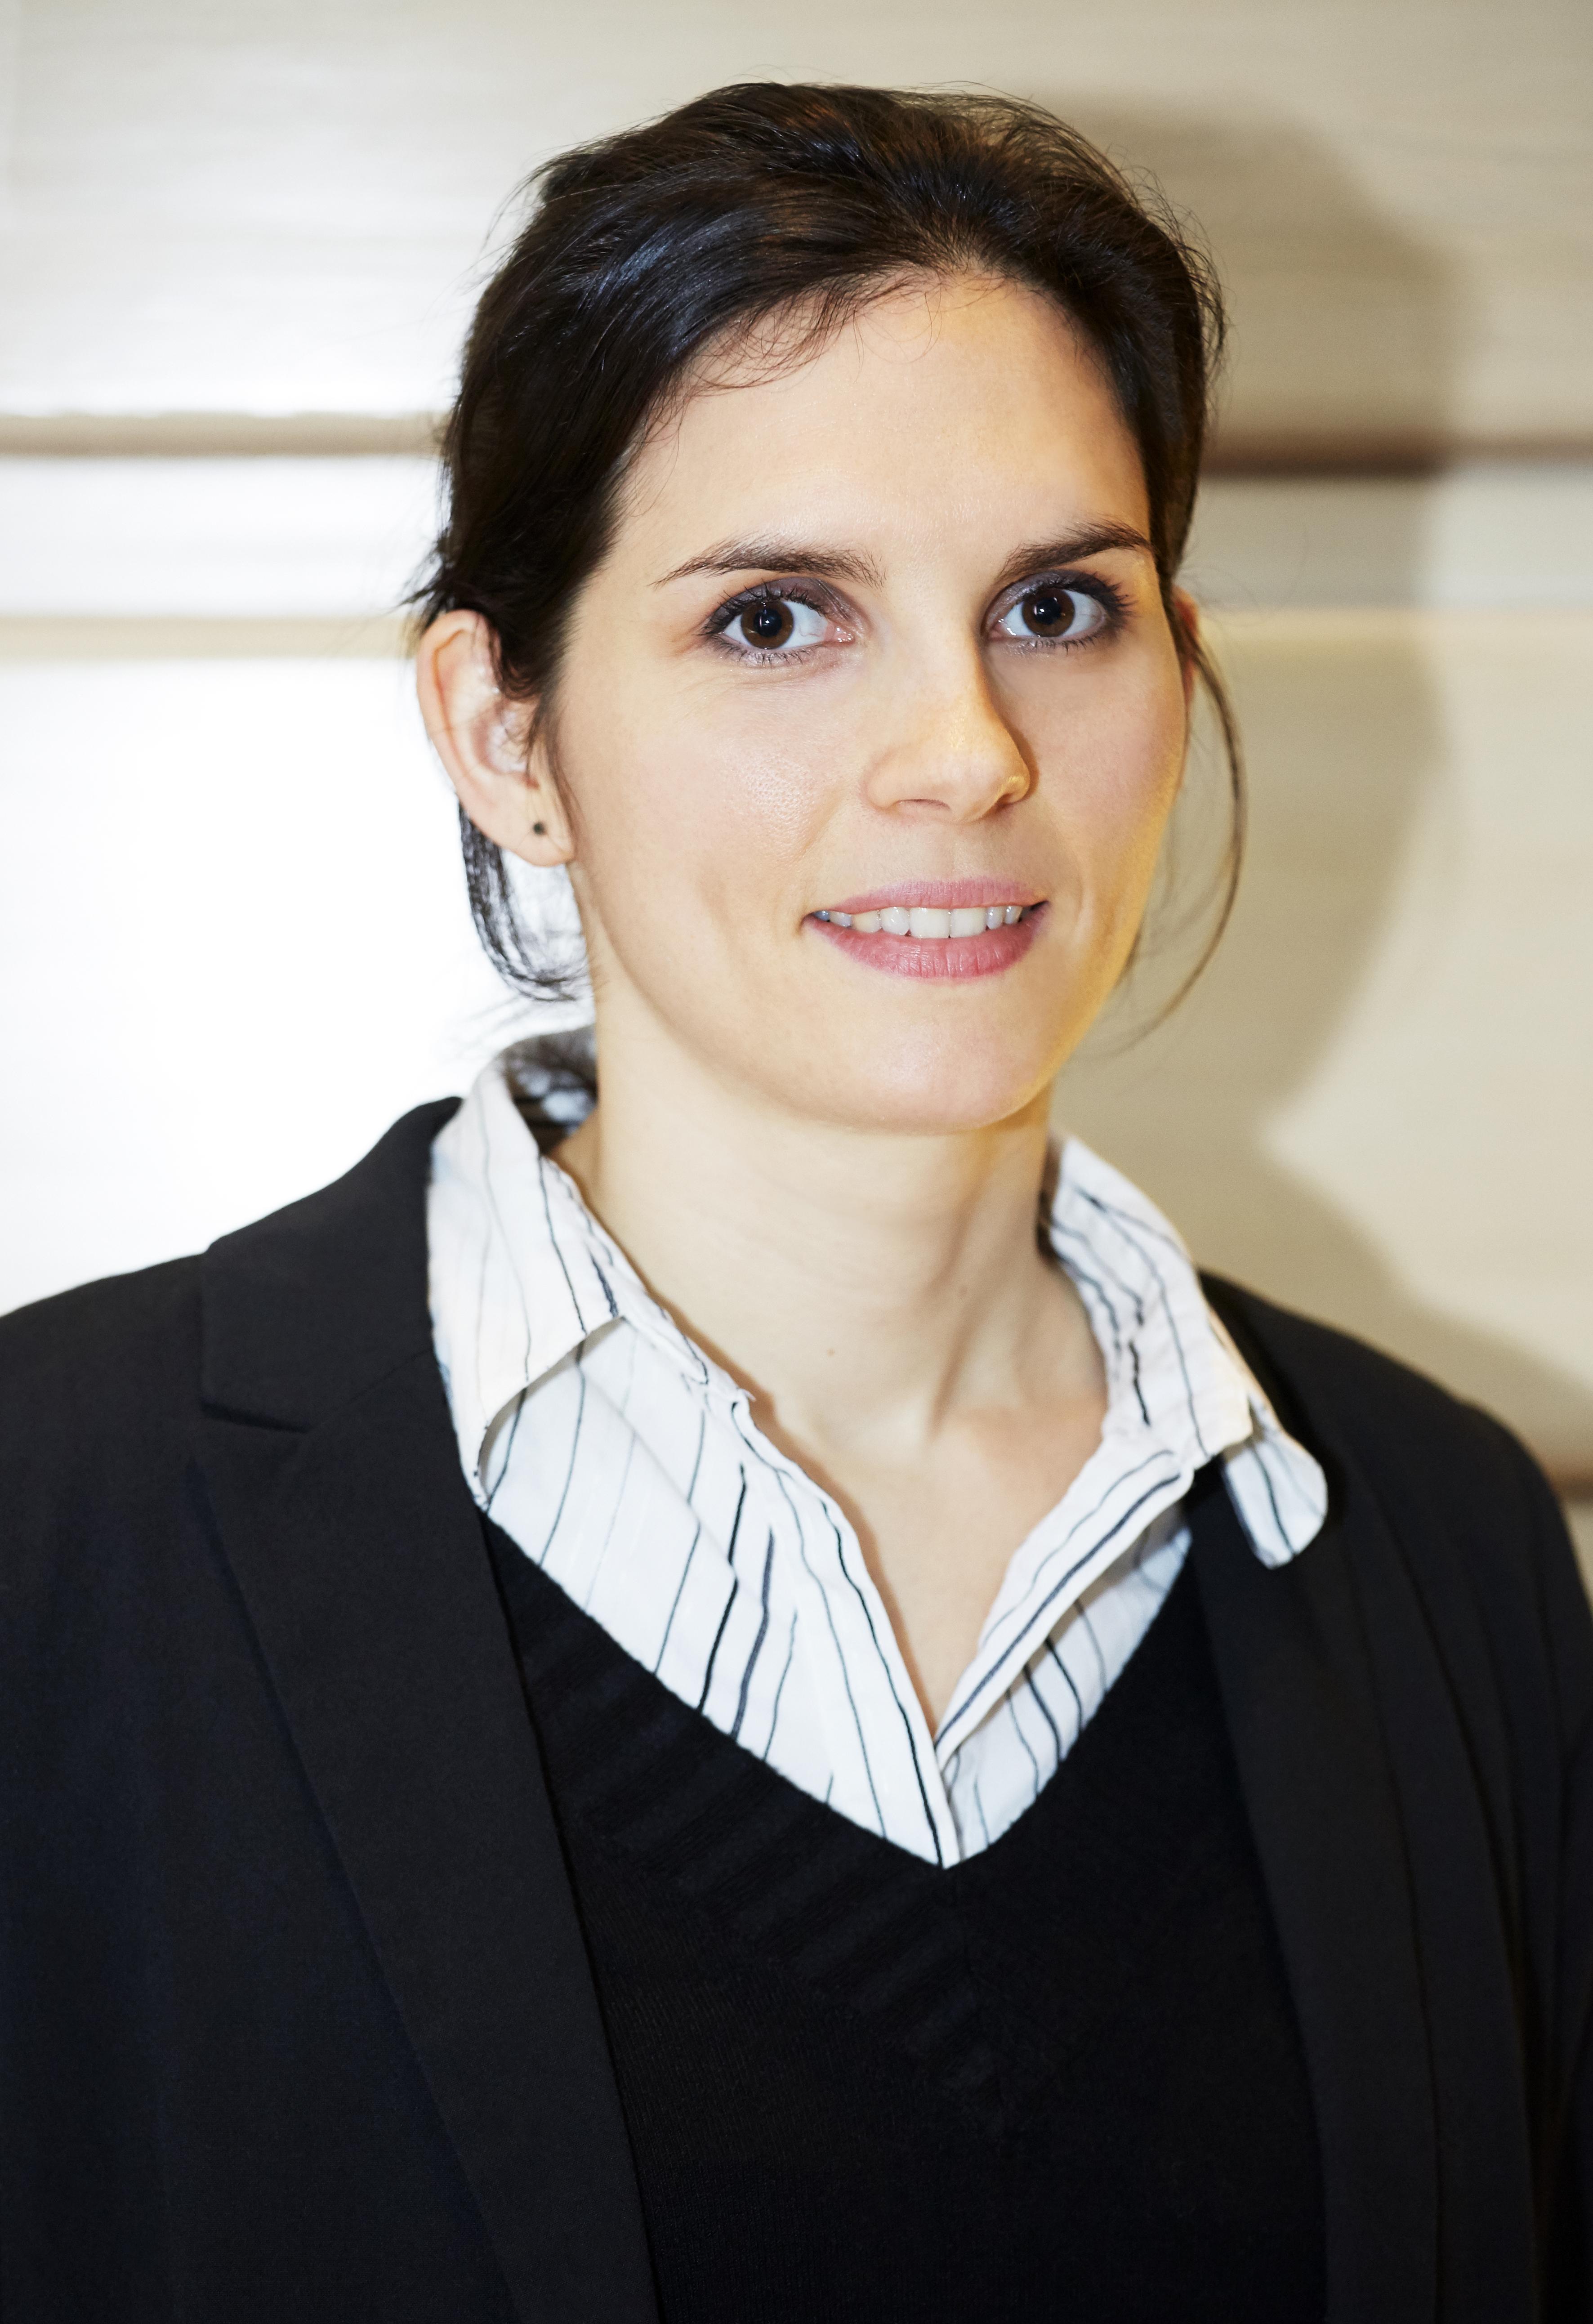 Audrey Vatus